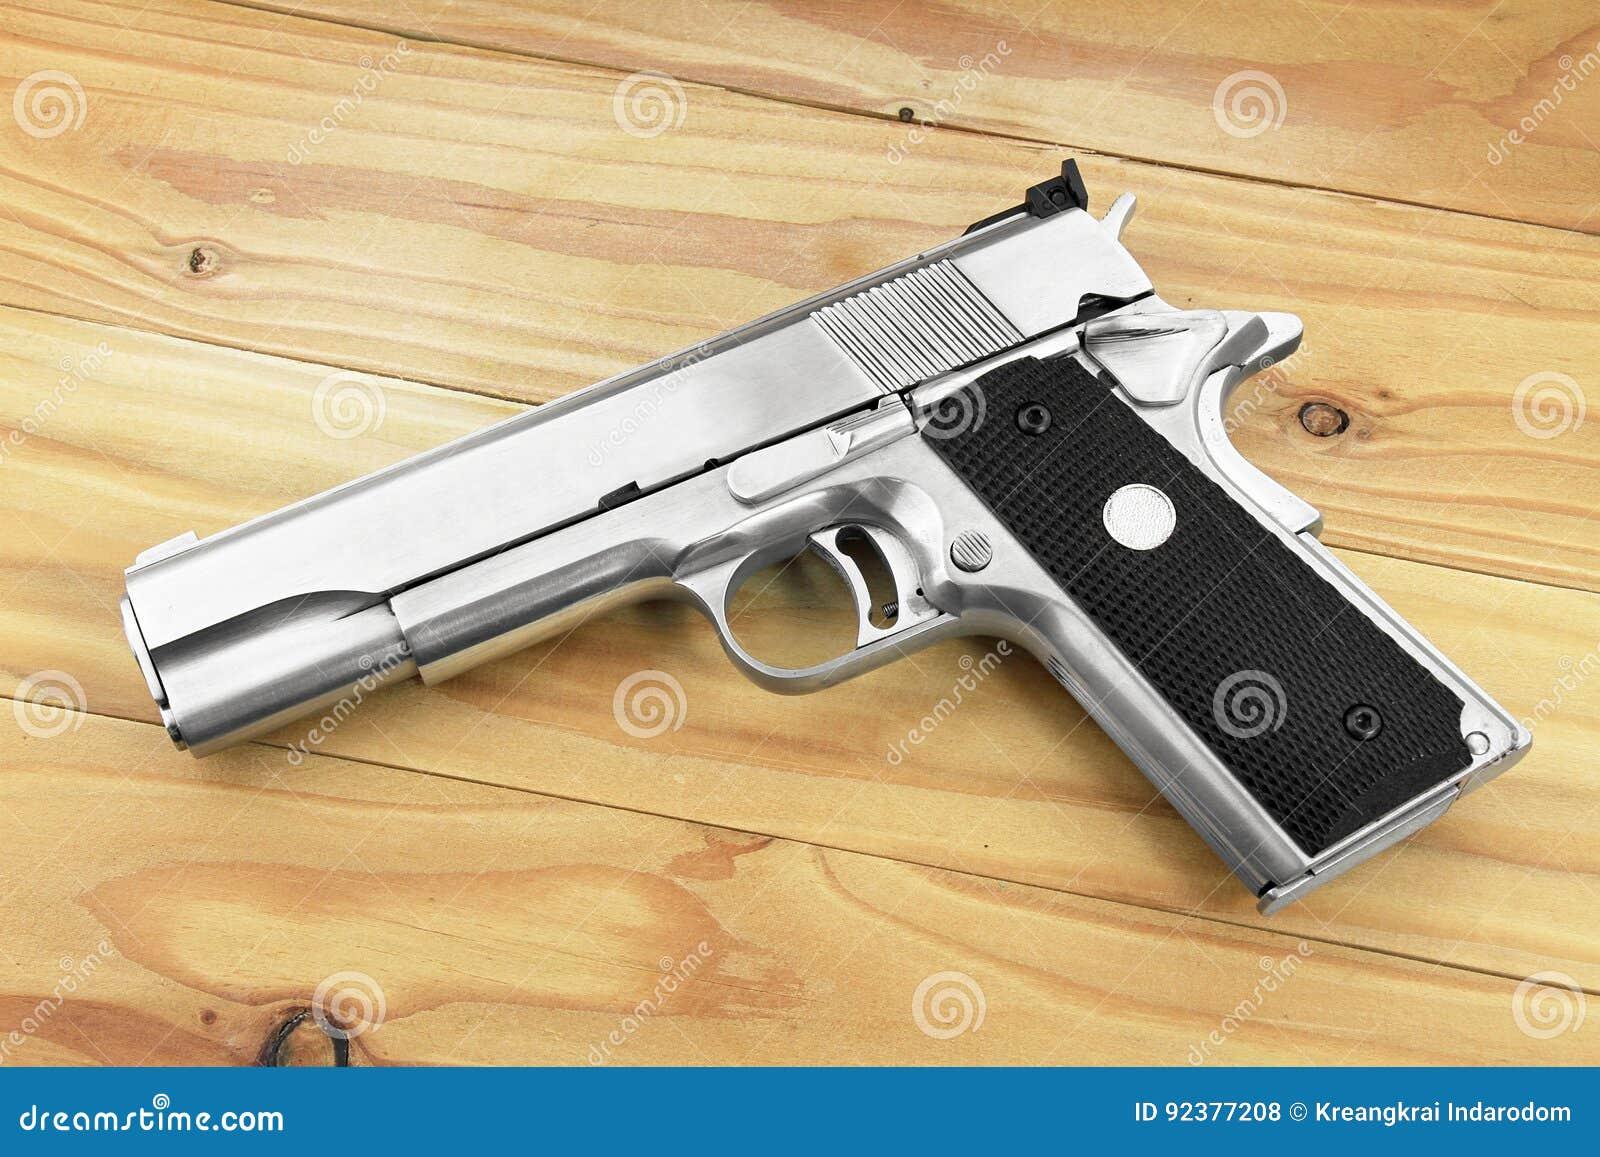 Semi-automatic handgun on grey wooden background, .45 pistol.